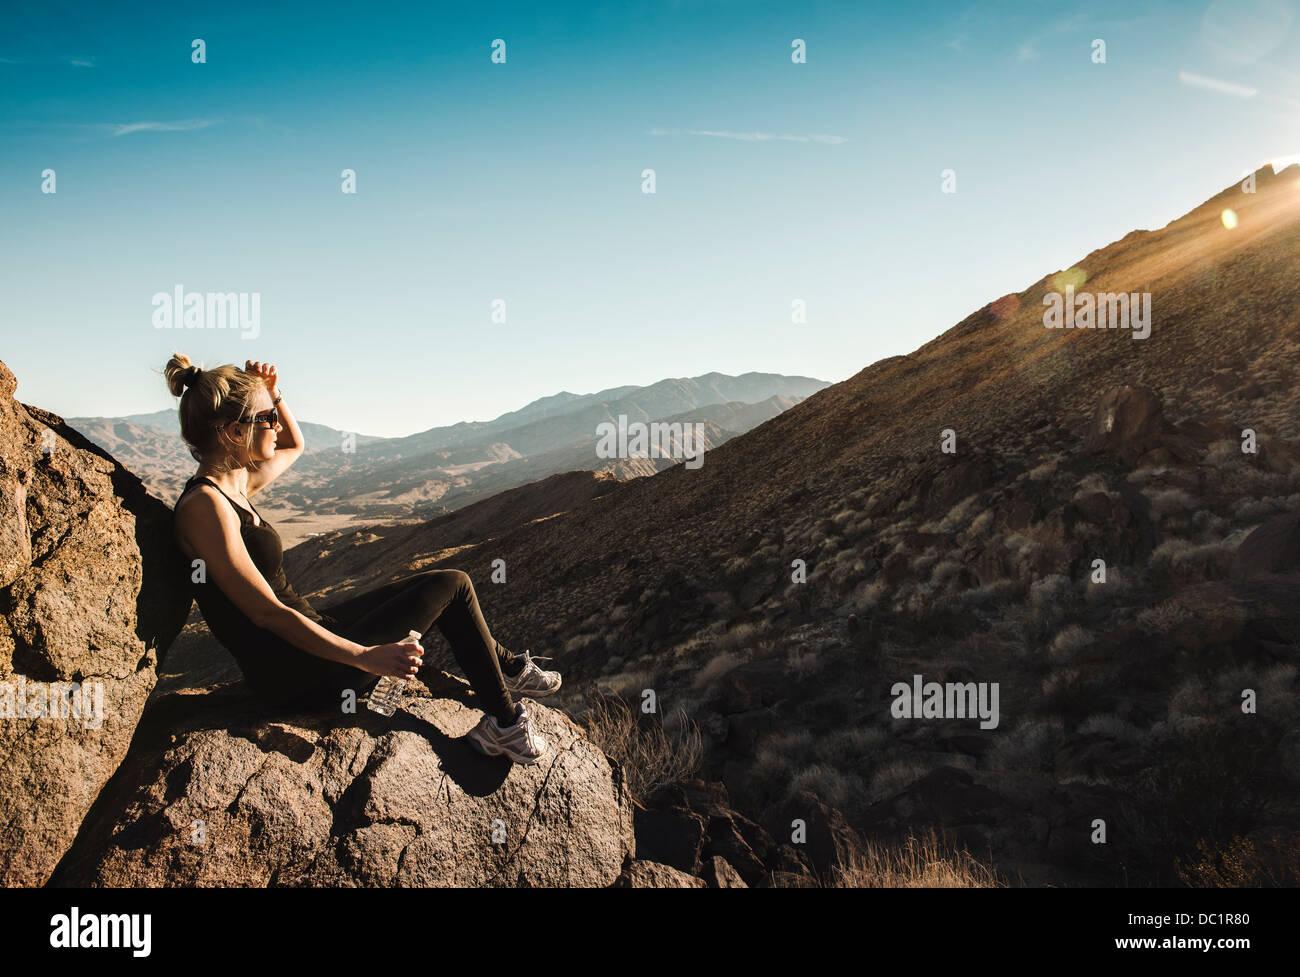 Mitte Erwachsene Wanderer betrachten in Palm Springs, Kalifornien, USA Stockbild